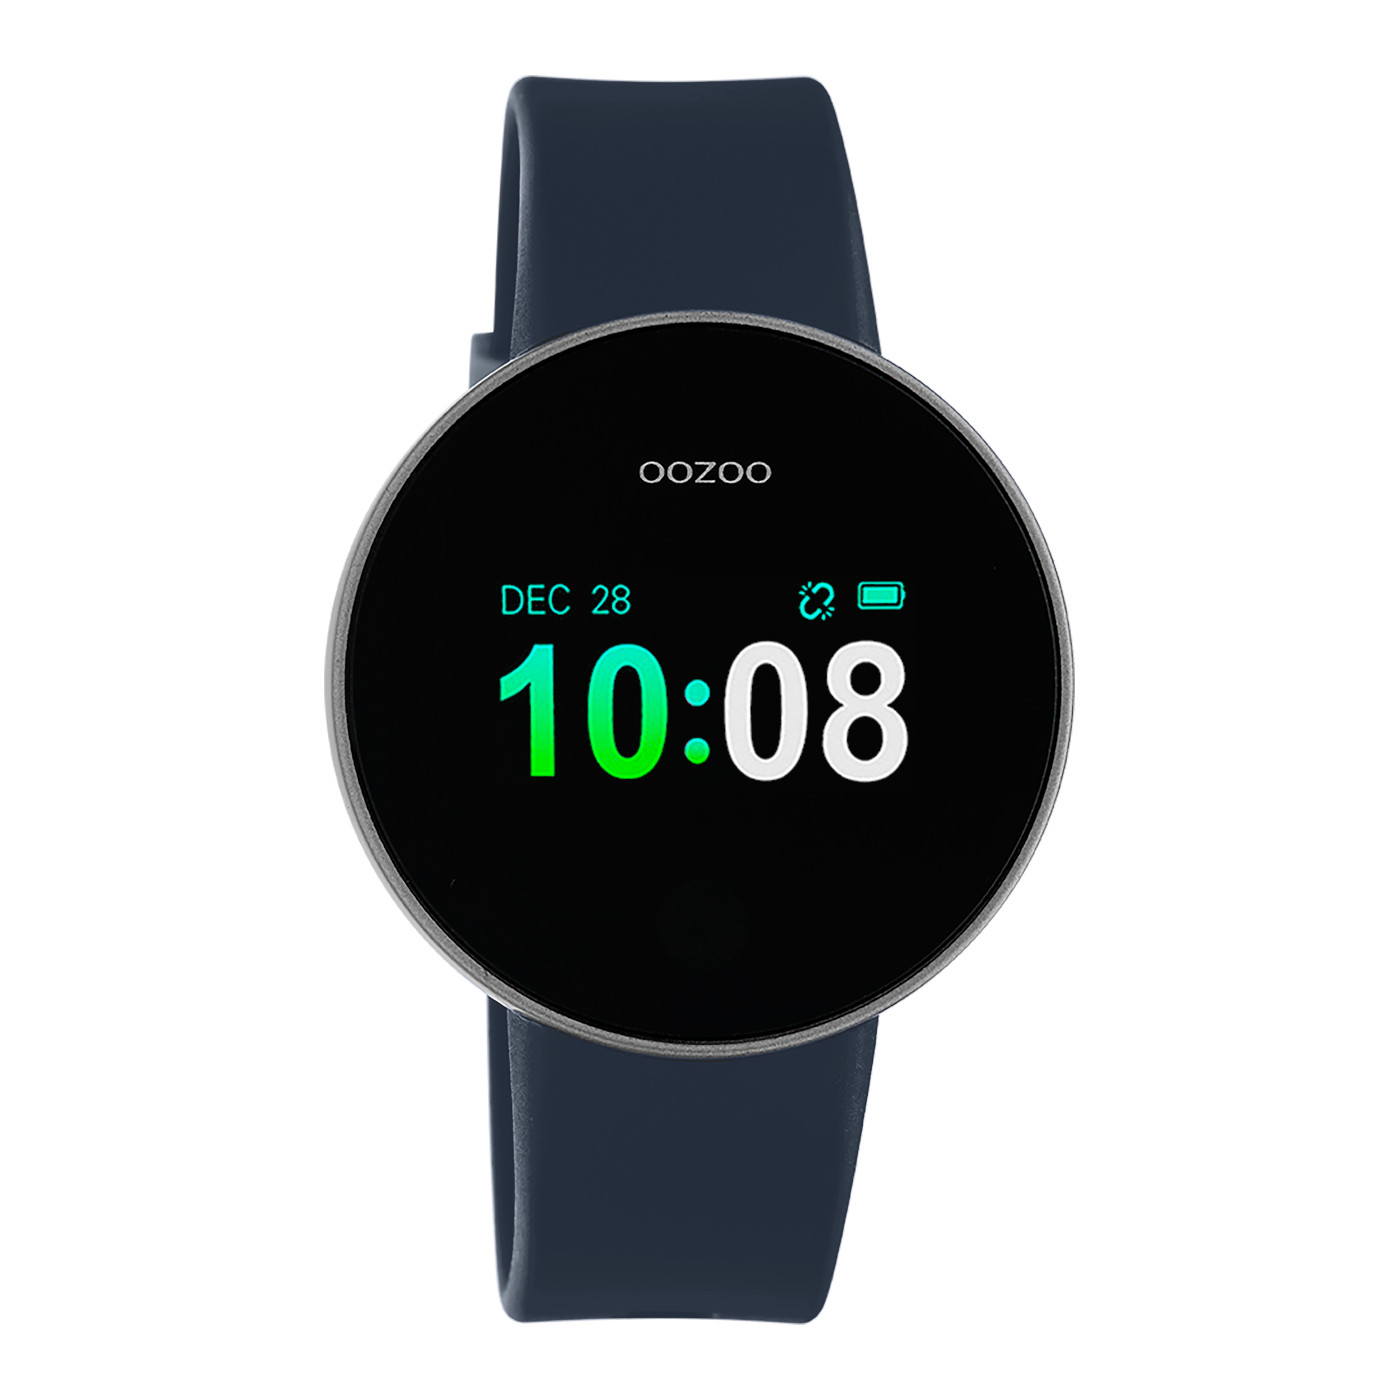 OOZOO Donkerblauw Display Smartwatch Q00206